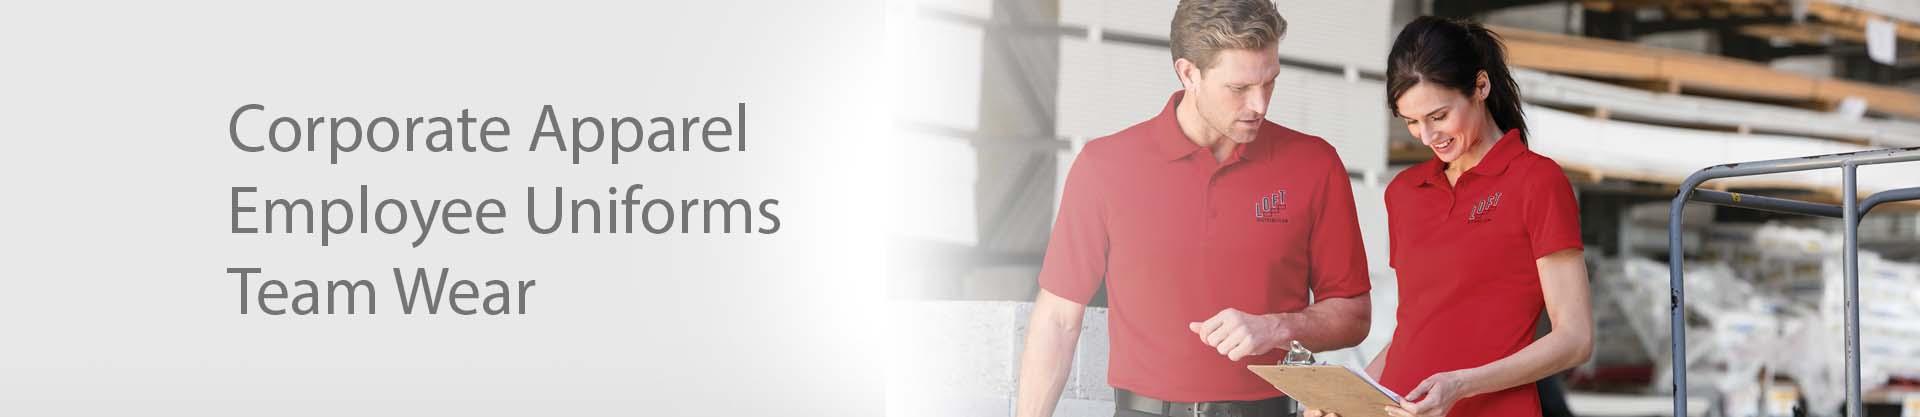 branded-apparel-employee-uniforms-team-wear image